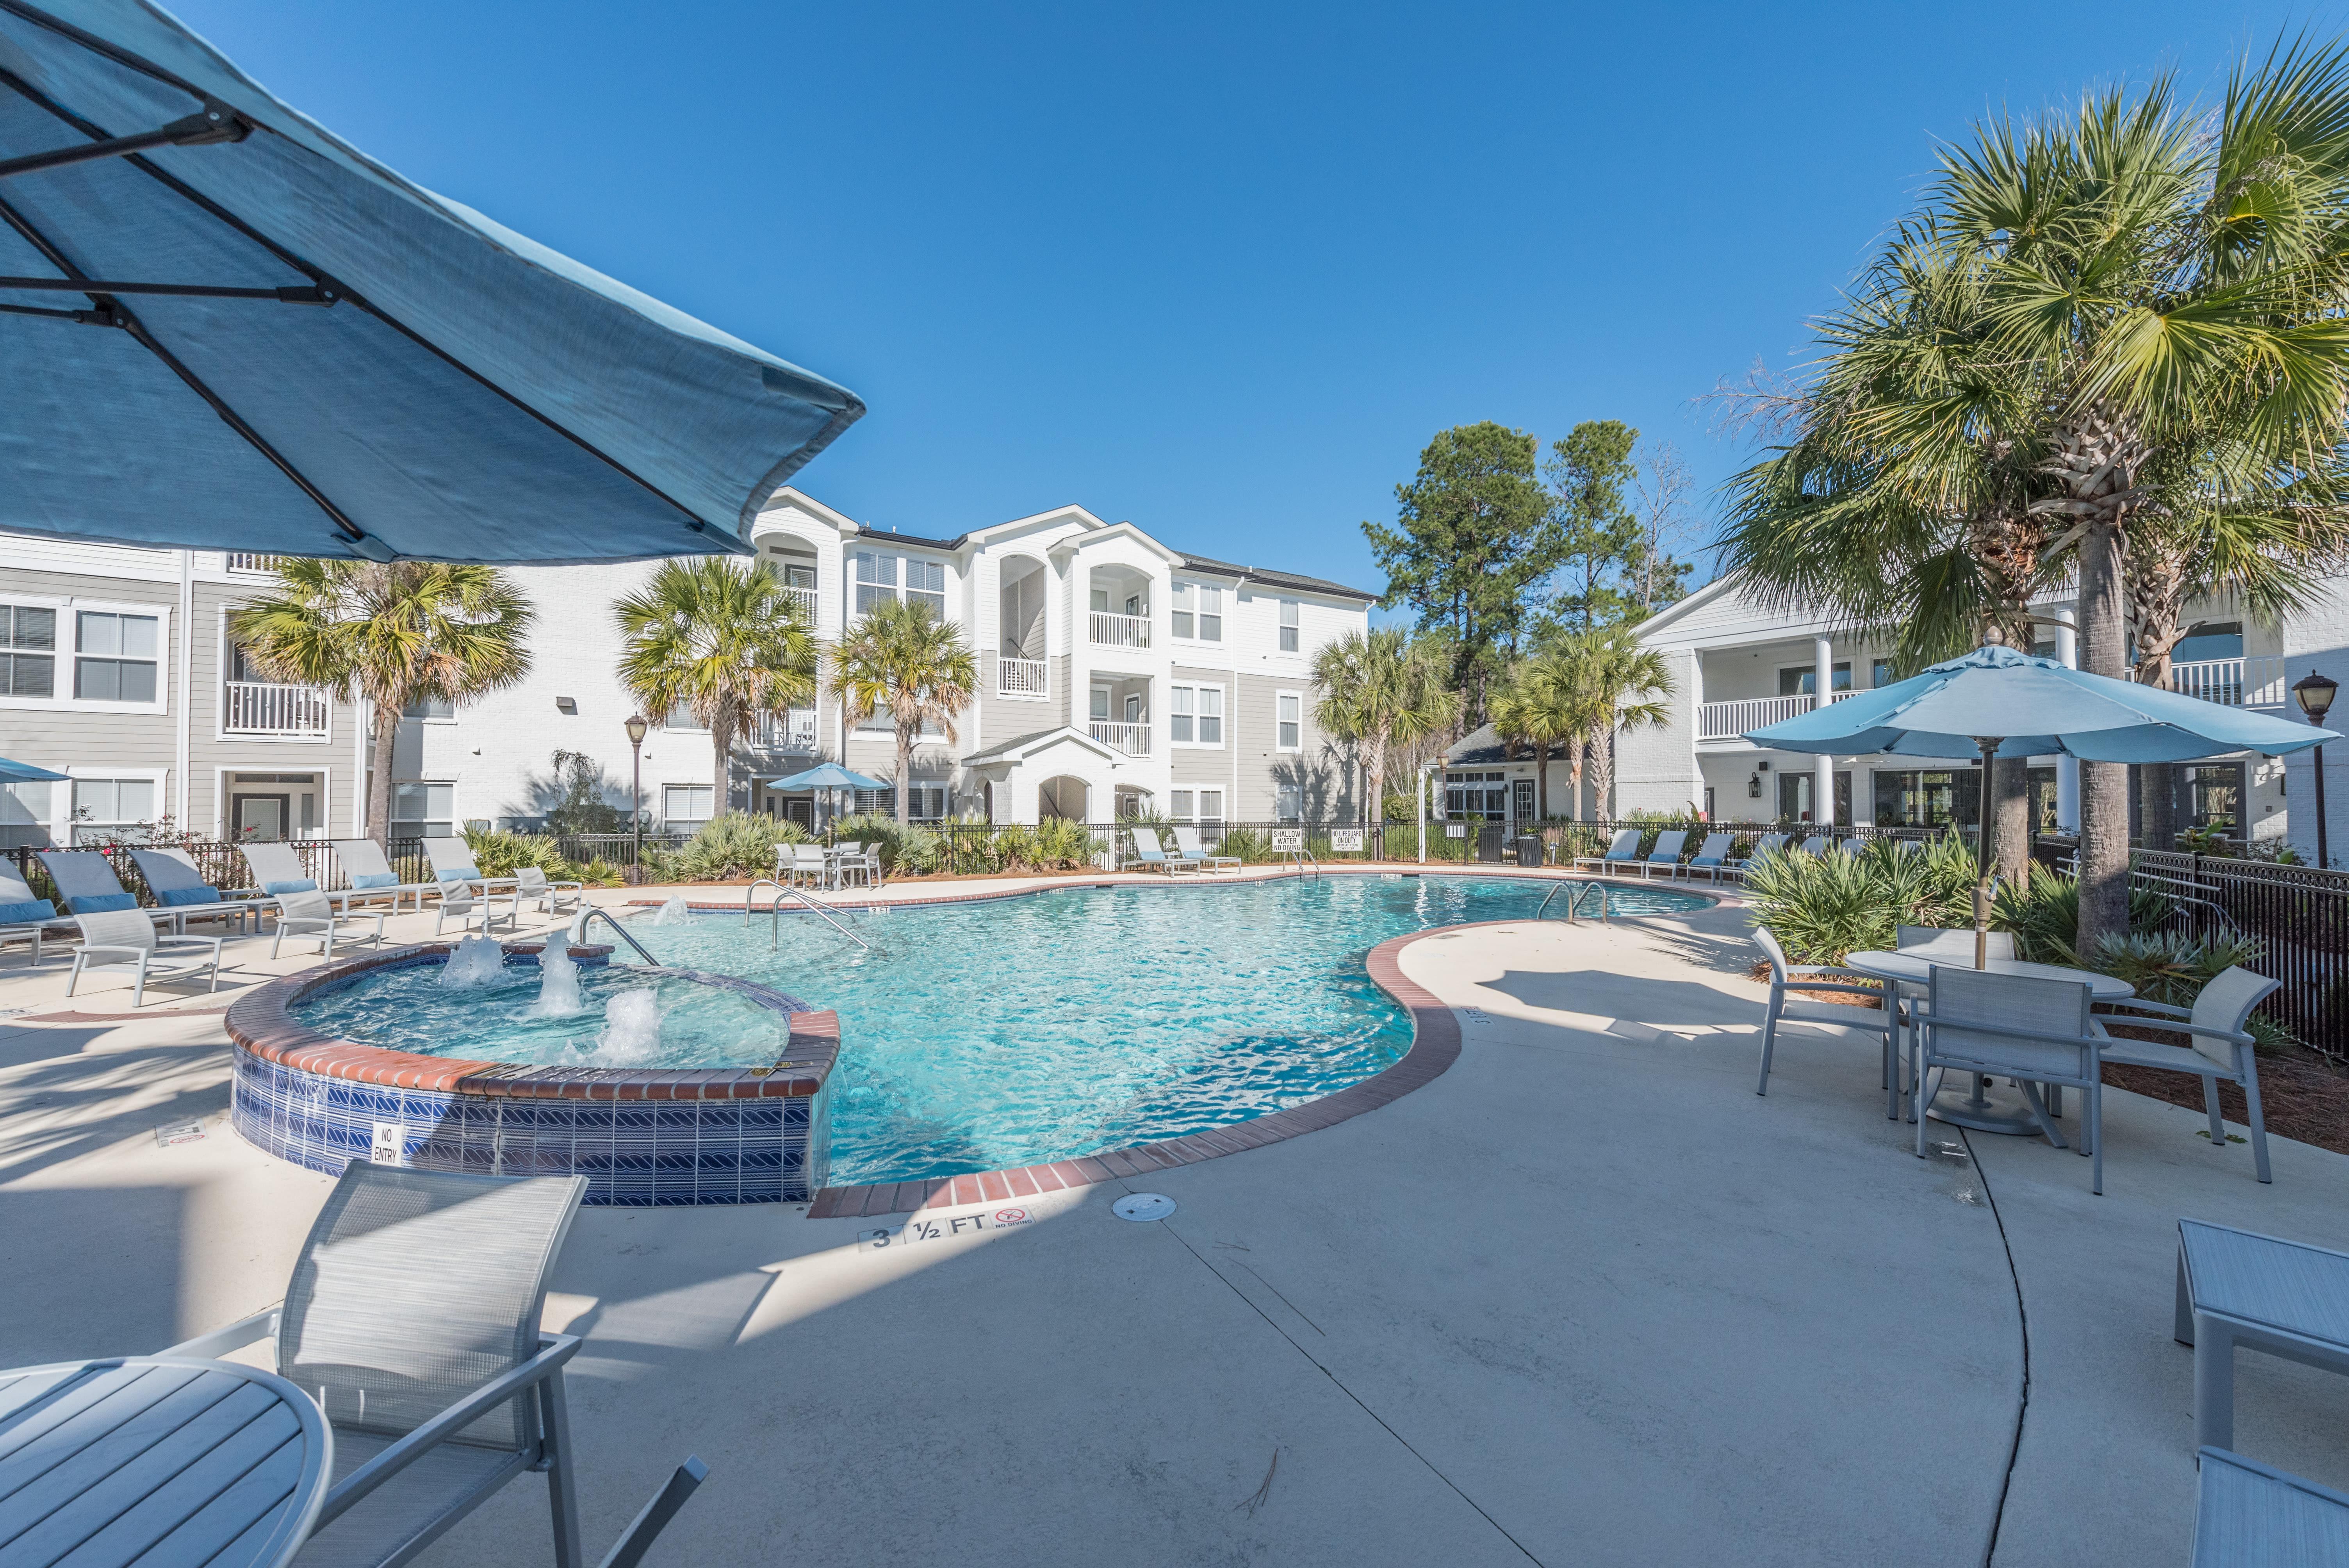 Sparkling pool at Ingleside Apartments in North Charleston, South Carolina